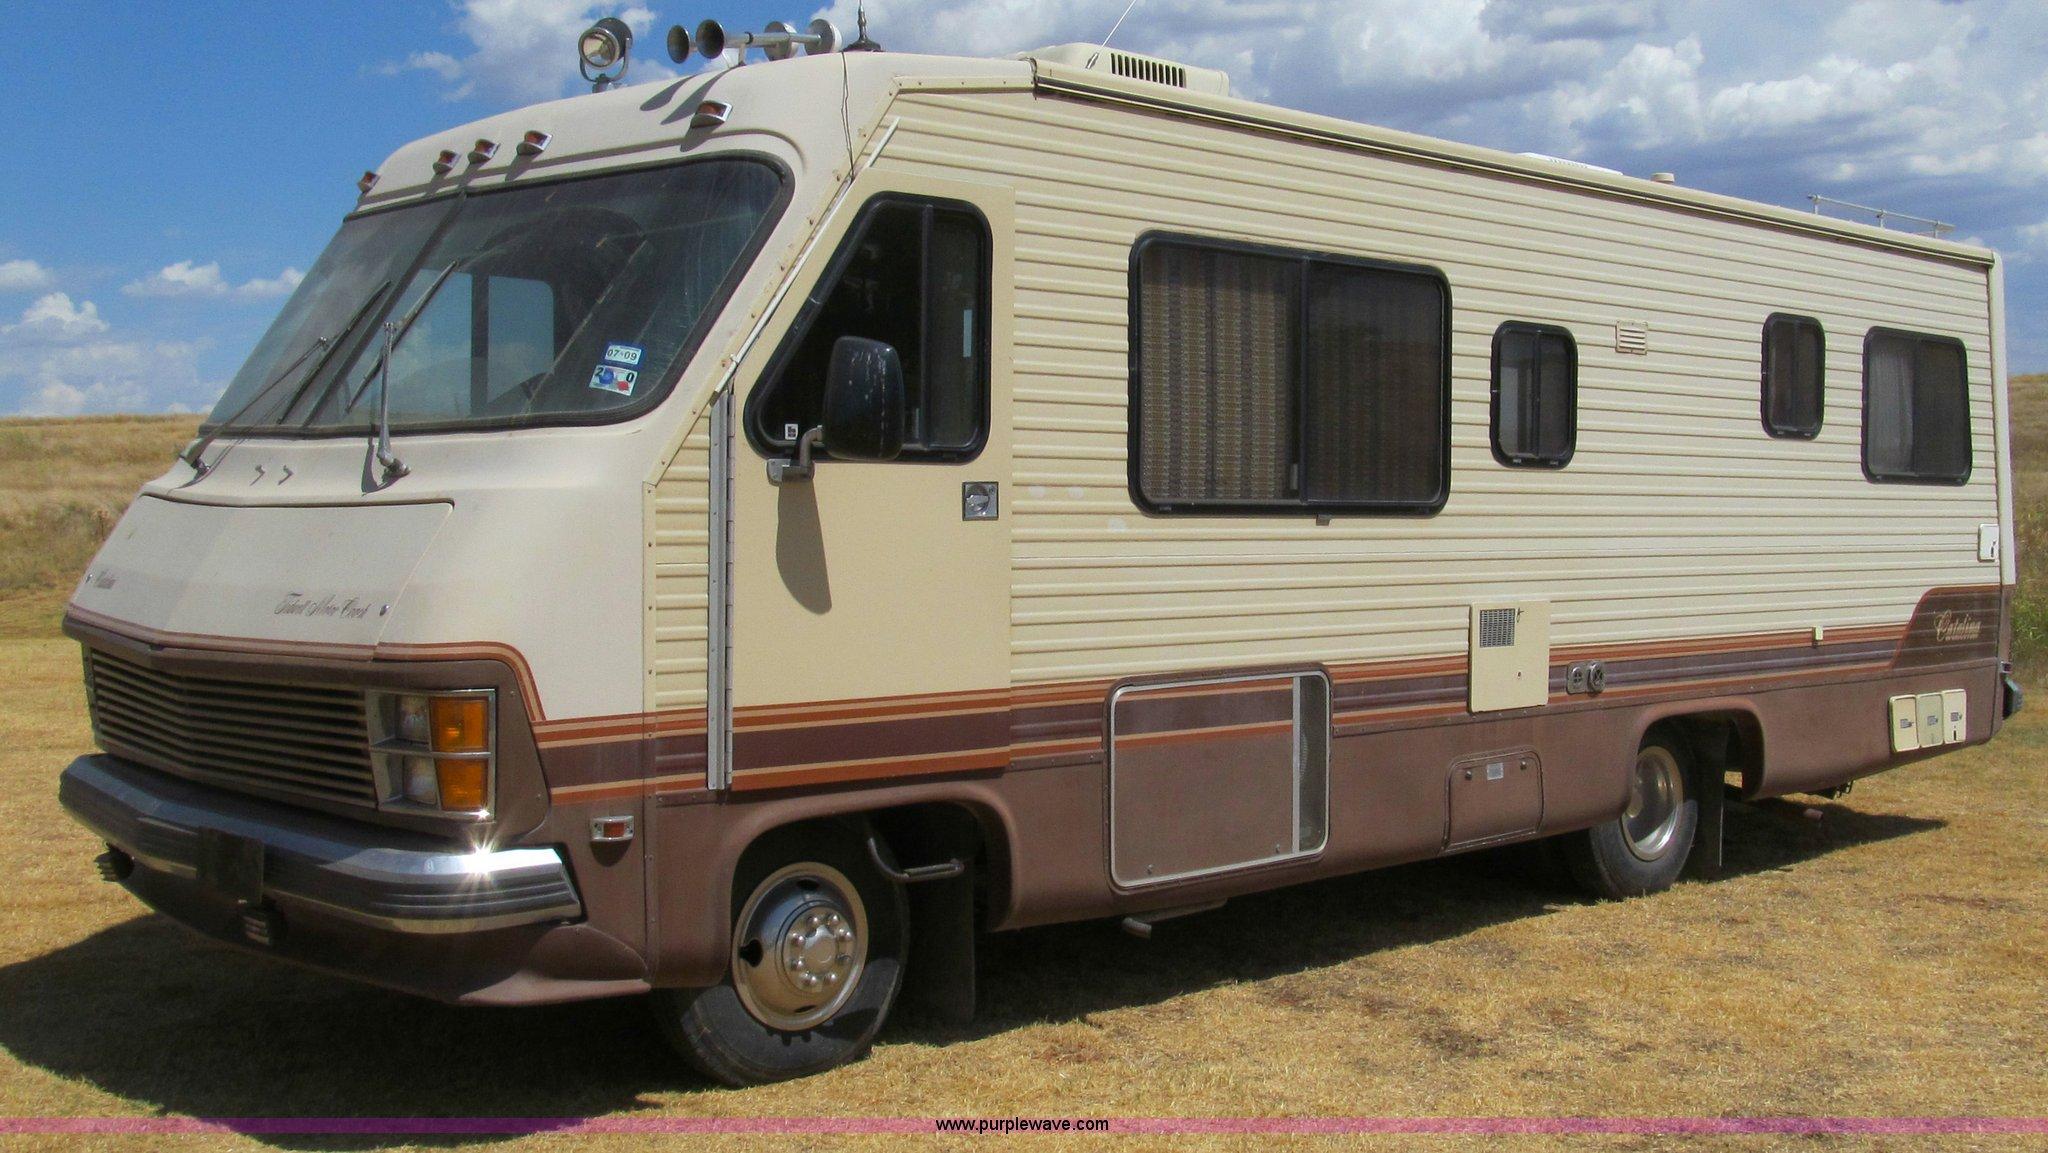 1985 Chevrolet P30 Catalina Tidwell 27' RV motor coach | Ite